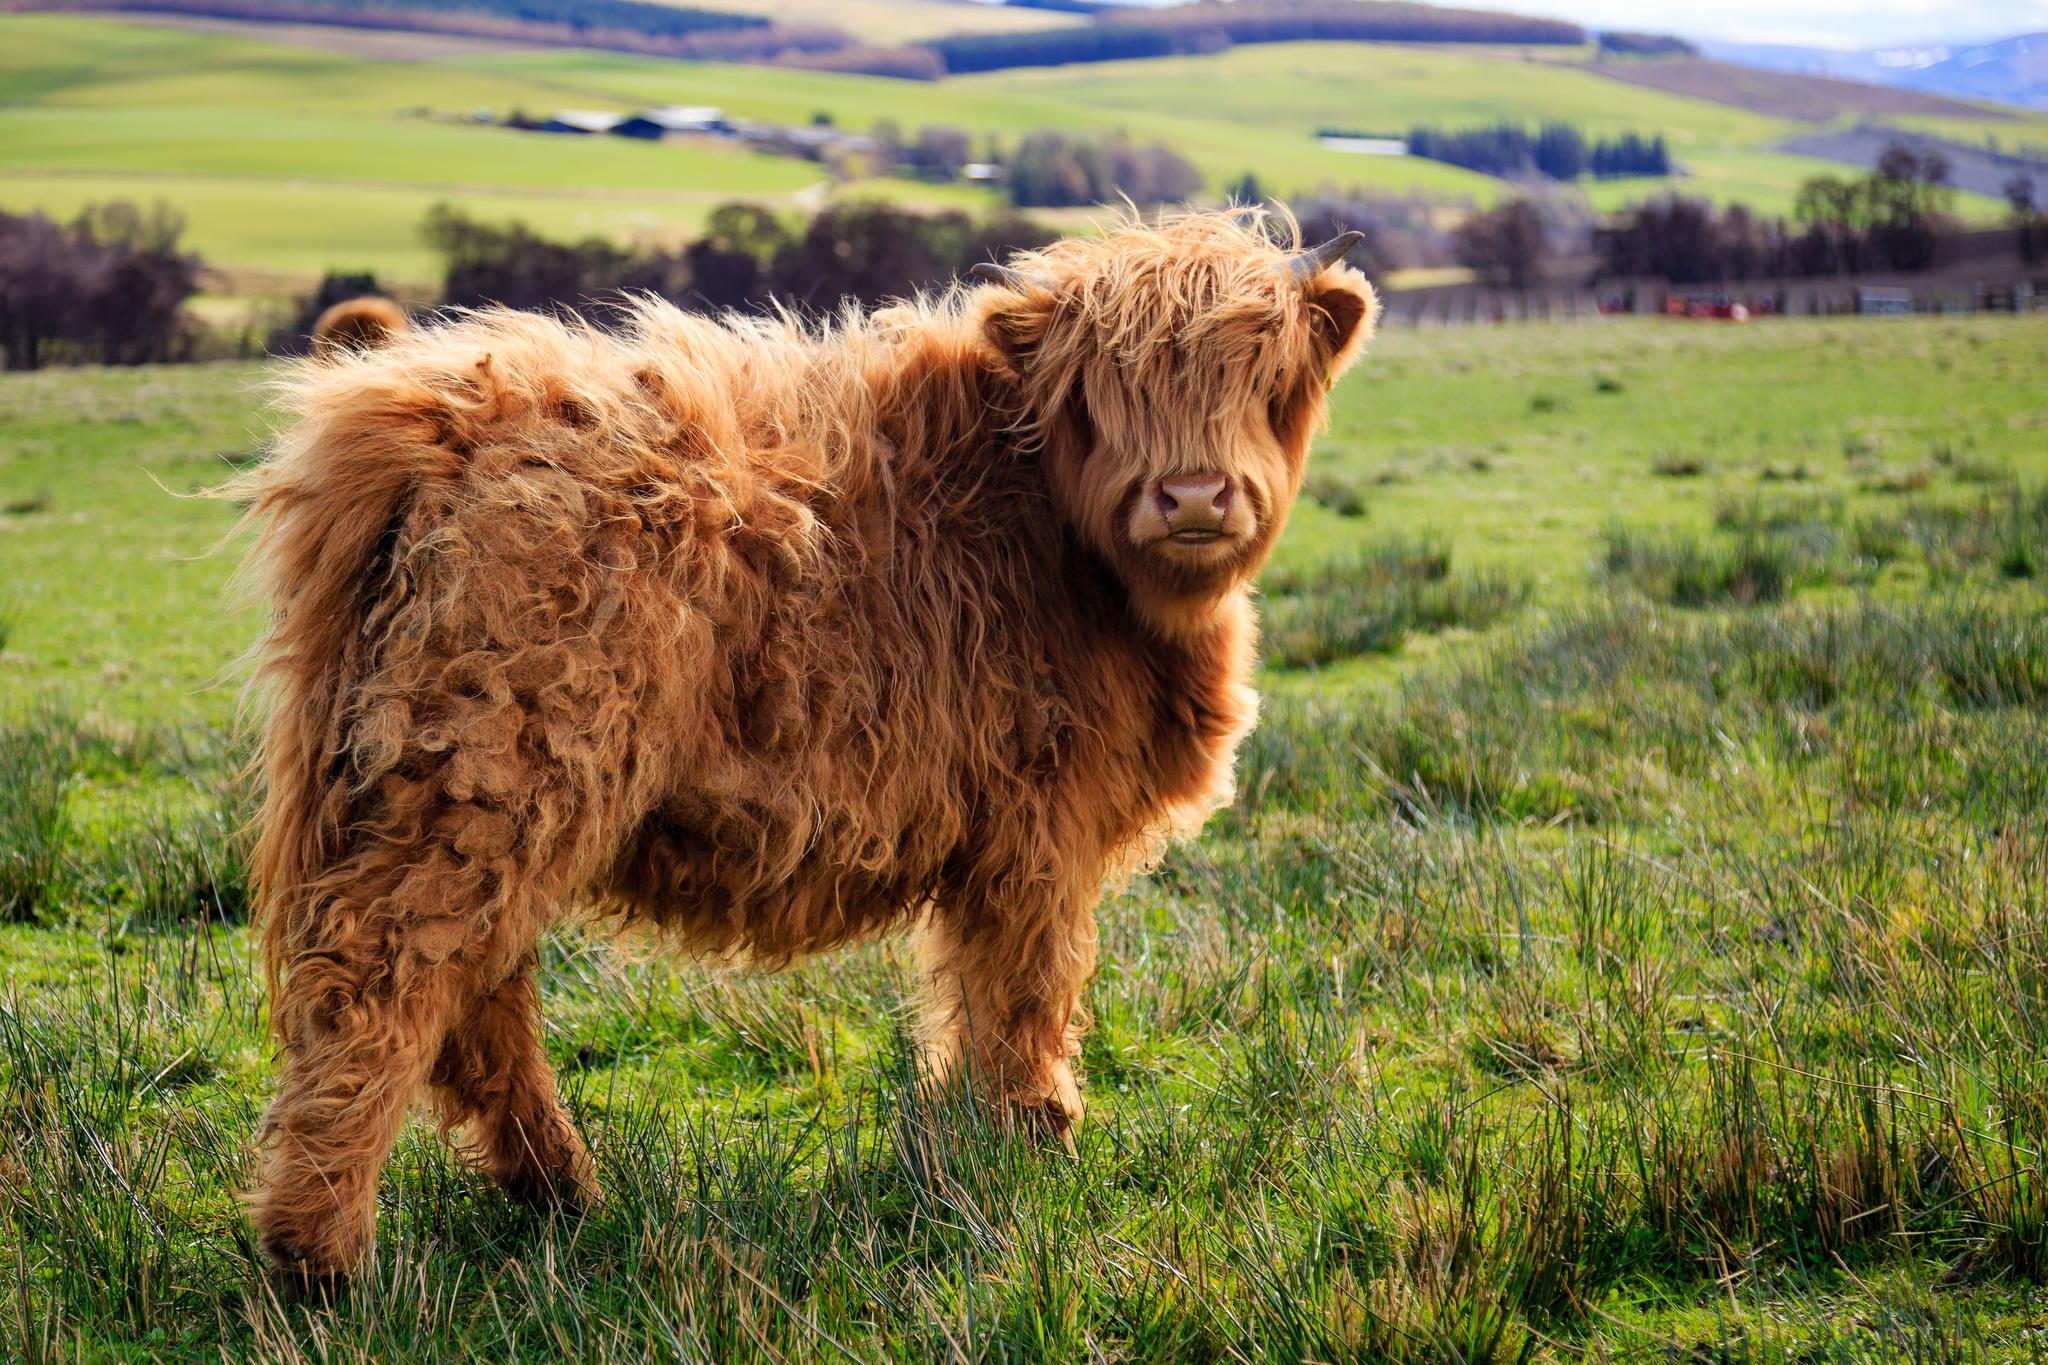 30+ Animali Con Un'Acconciatura Fantastica